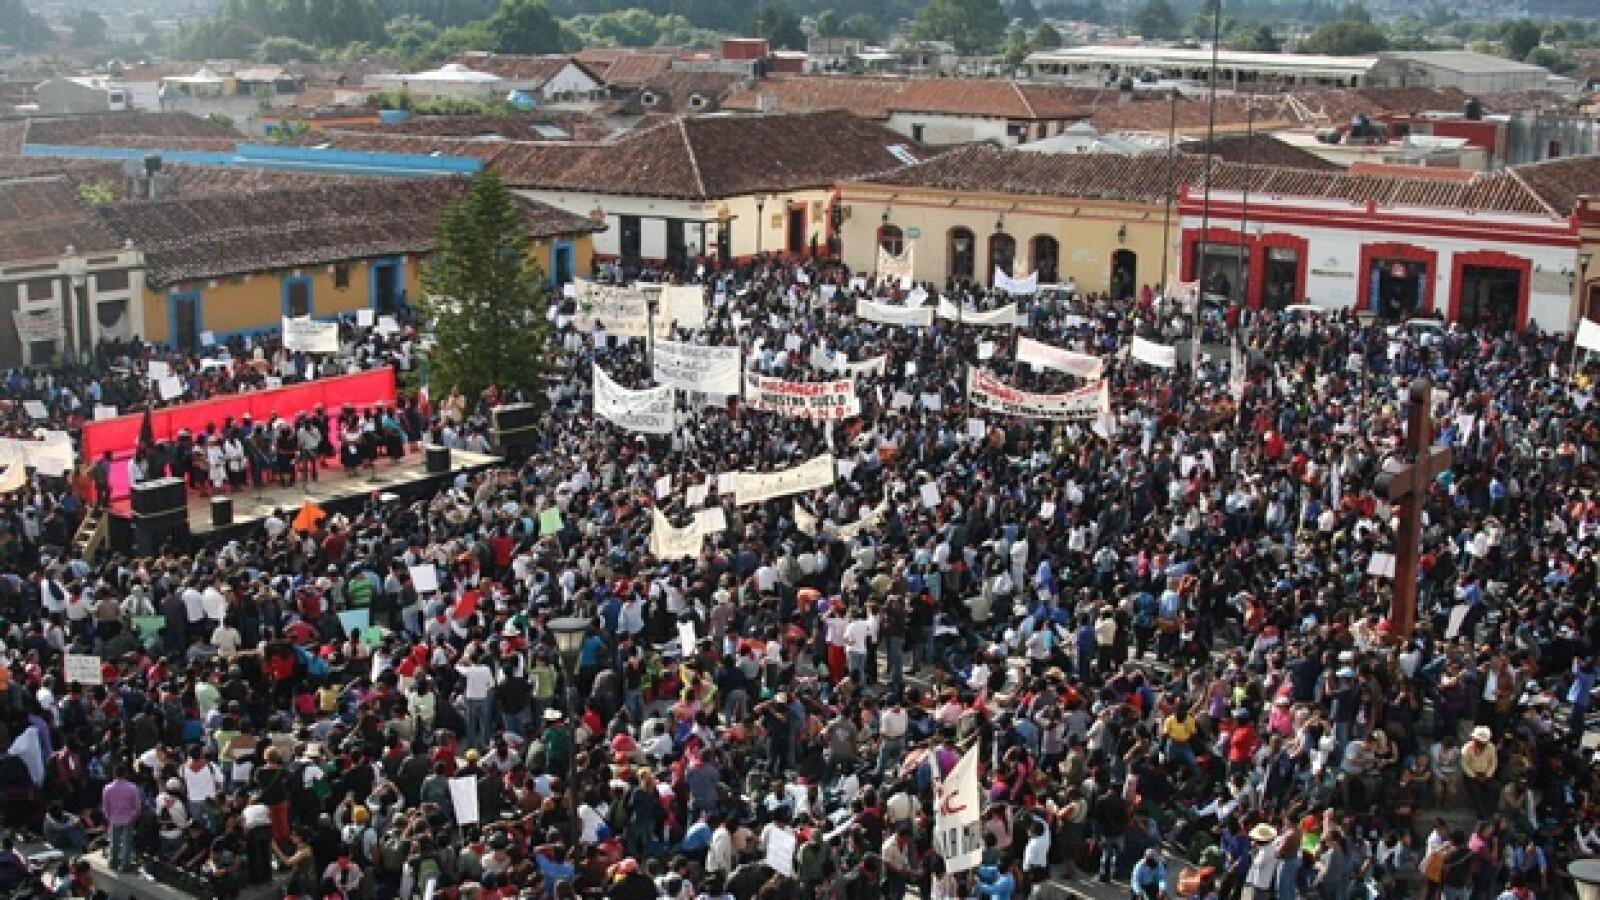 los integrantes del ezln se reunen en la plaza de la paz en la